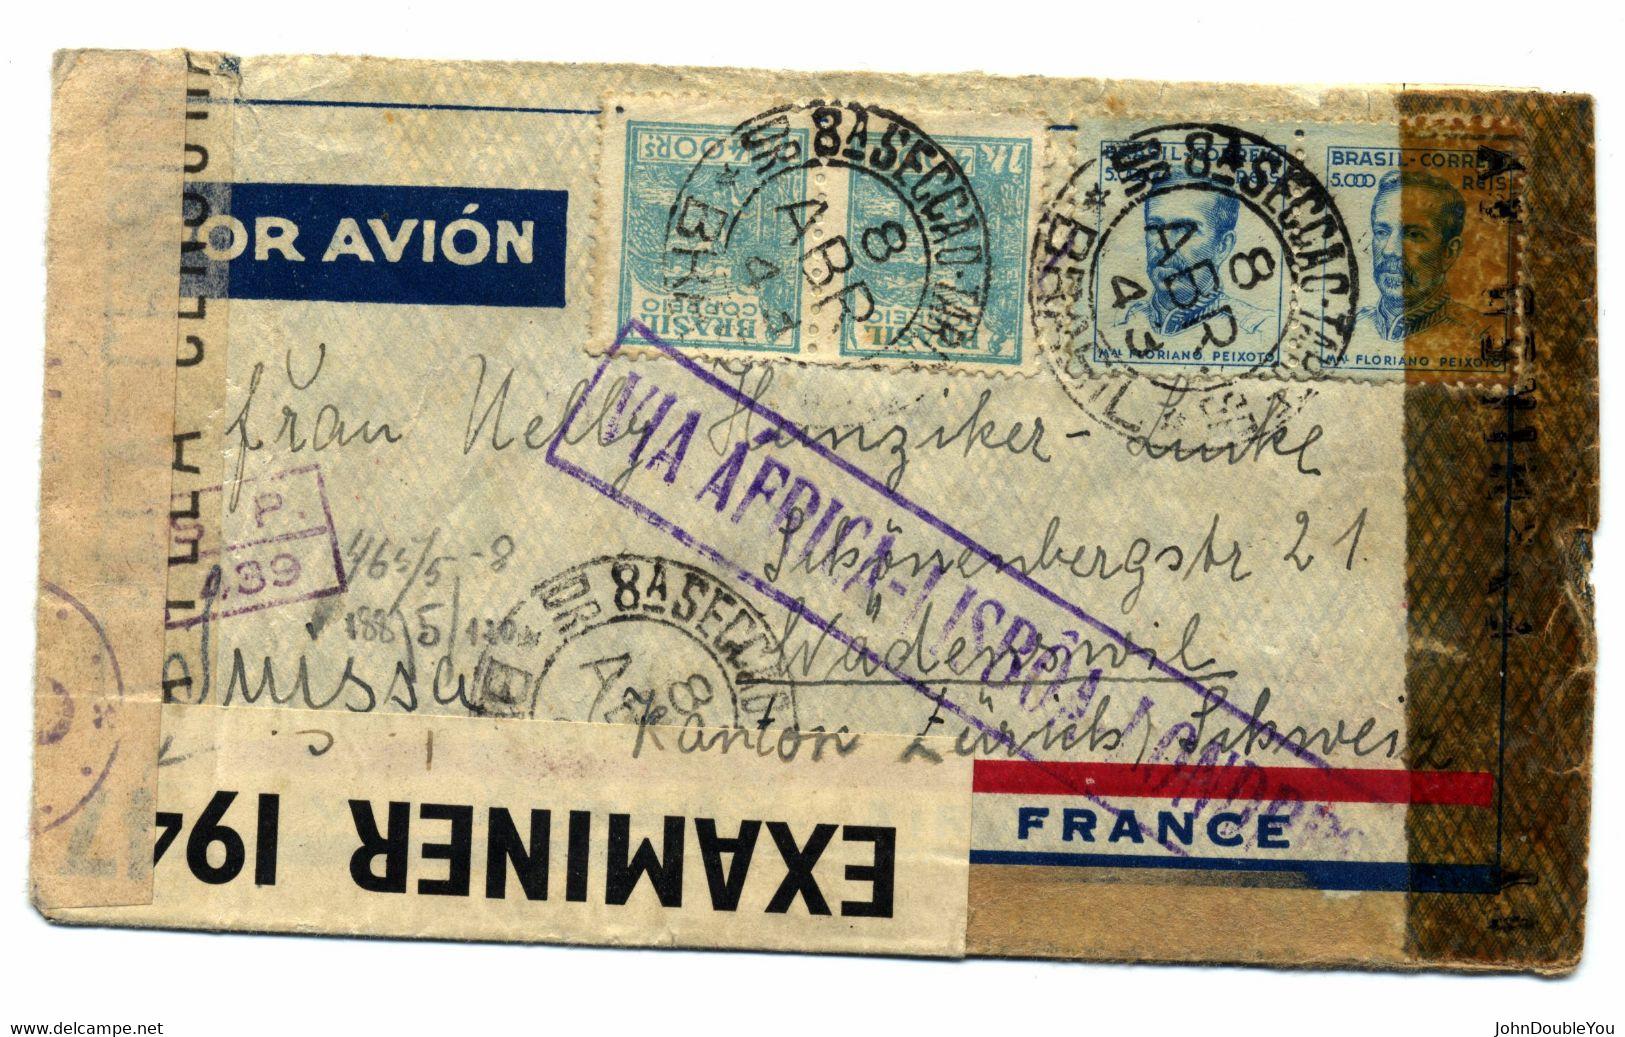 Luchtpost Brief Brazilië - Airmail Letter Brasil - Carta De Correio Aéreo 1943 - Storia Postale